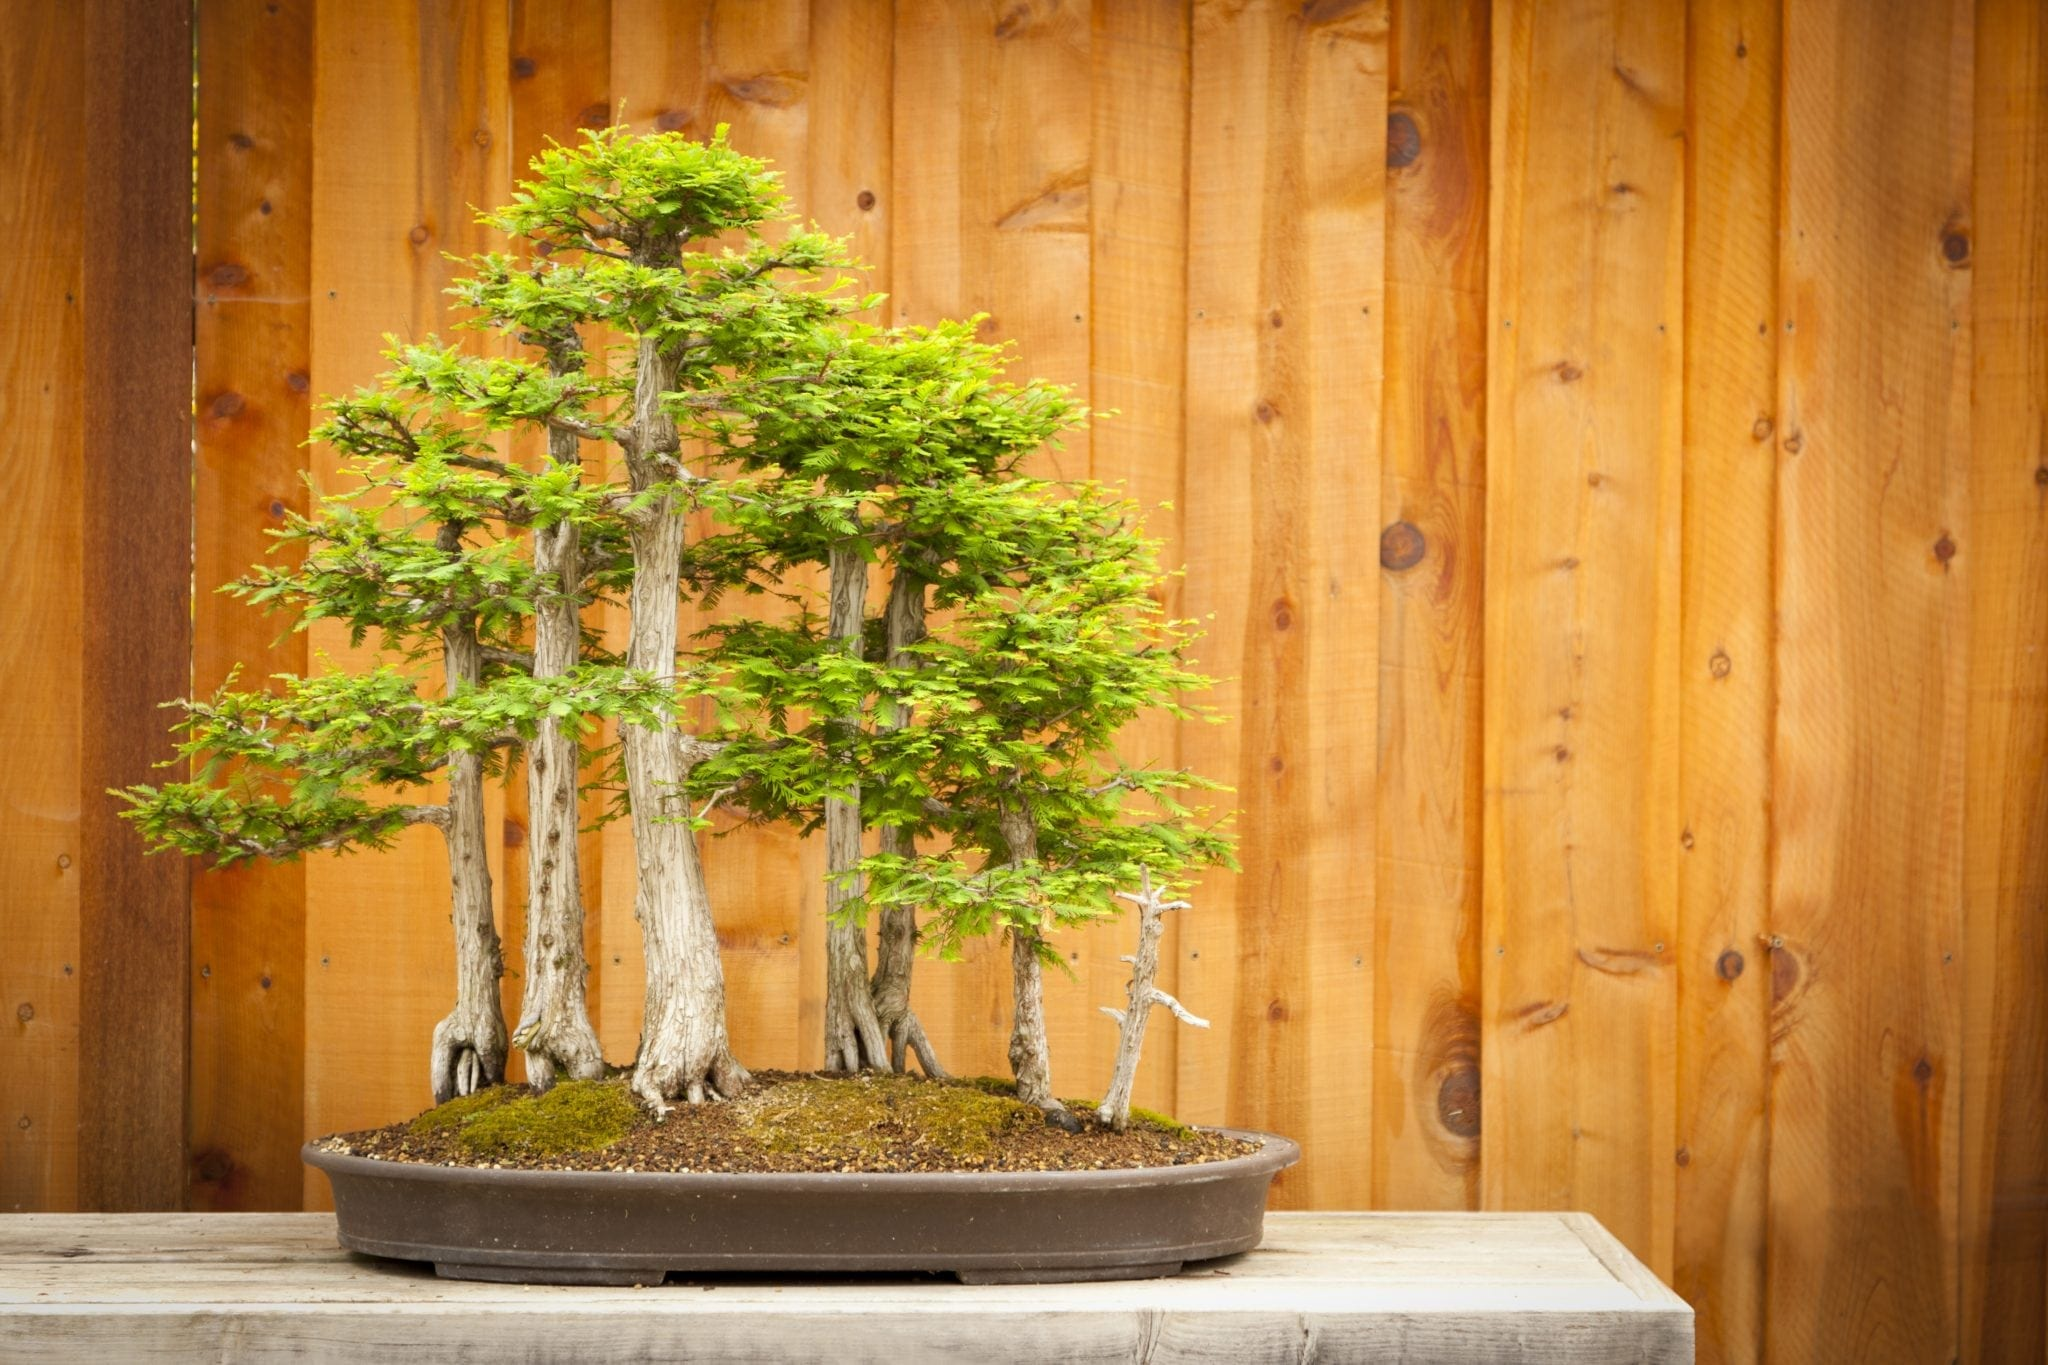 Bald Cypress Bonsai Tree Care Guide Taxodium Distichum Bonsai Tree Gardener